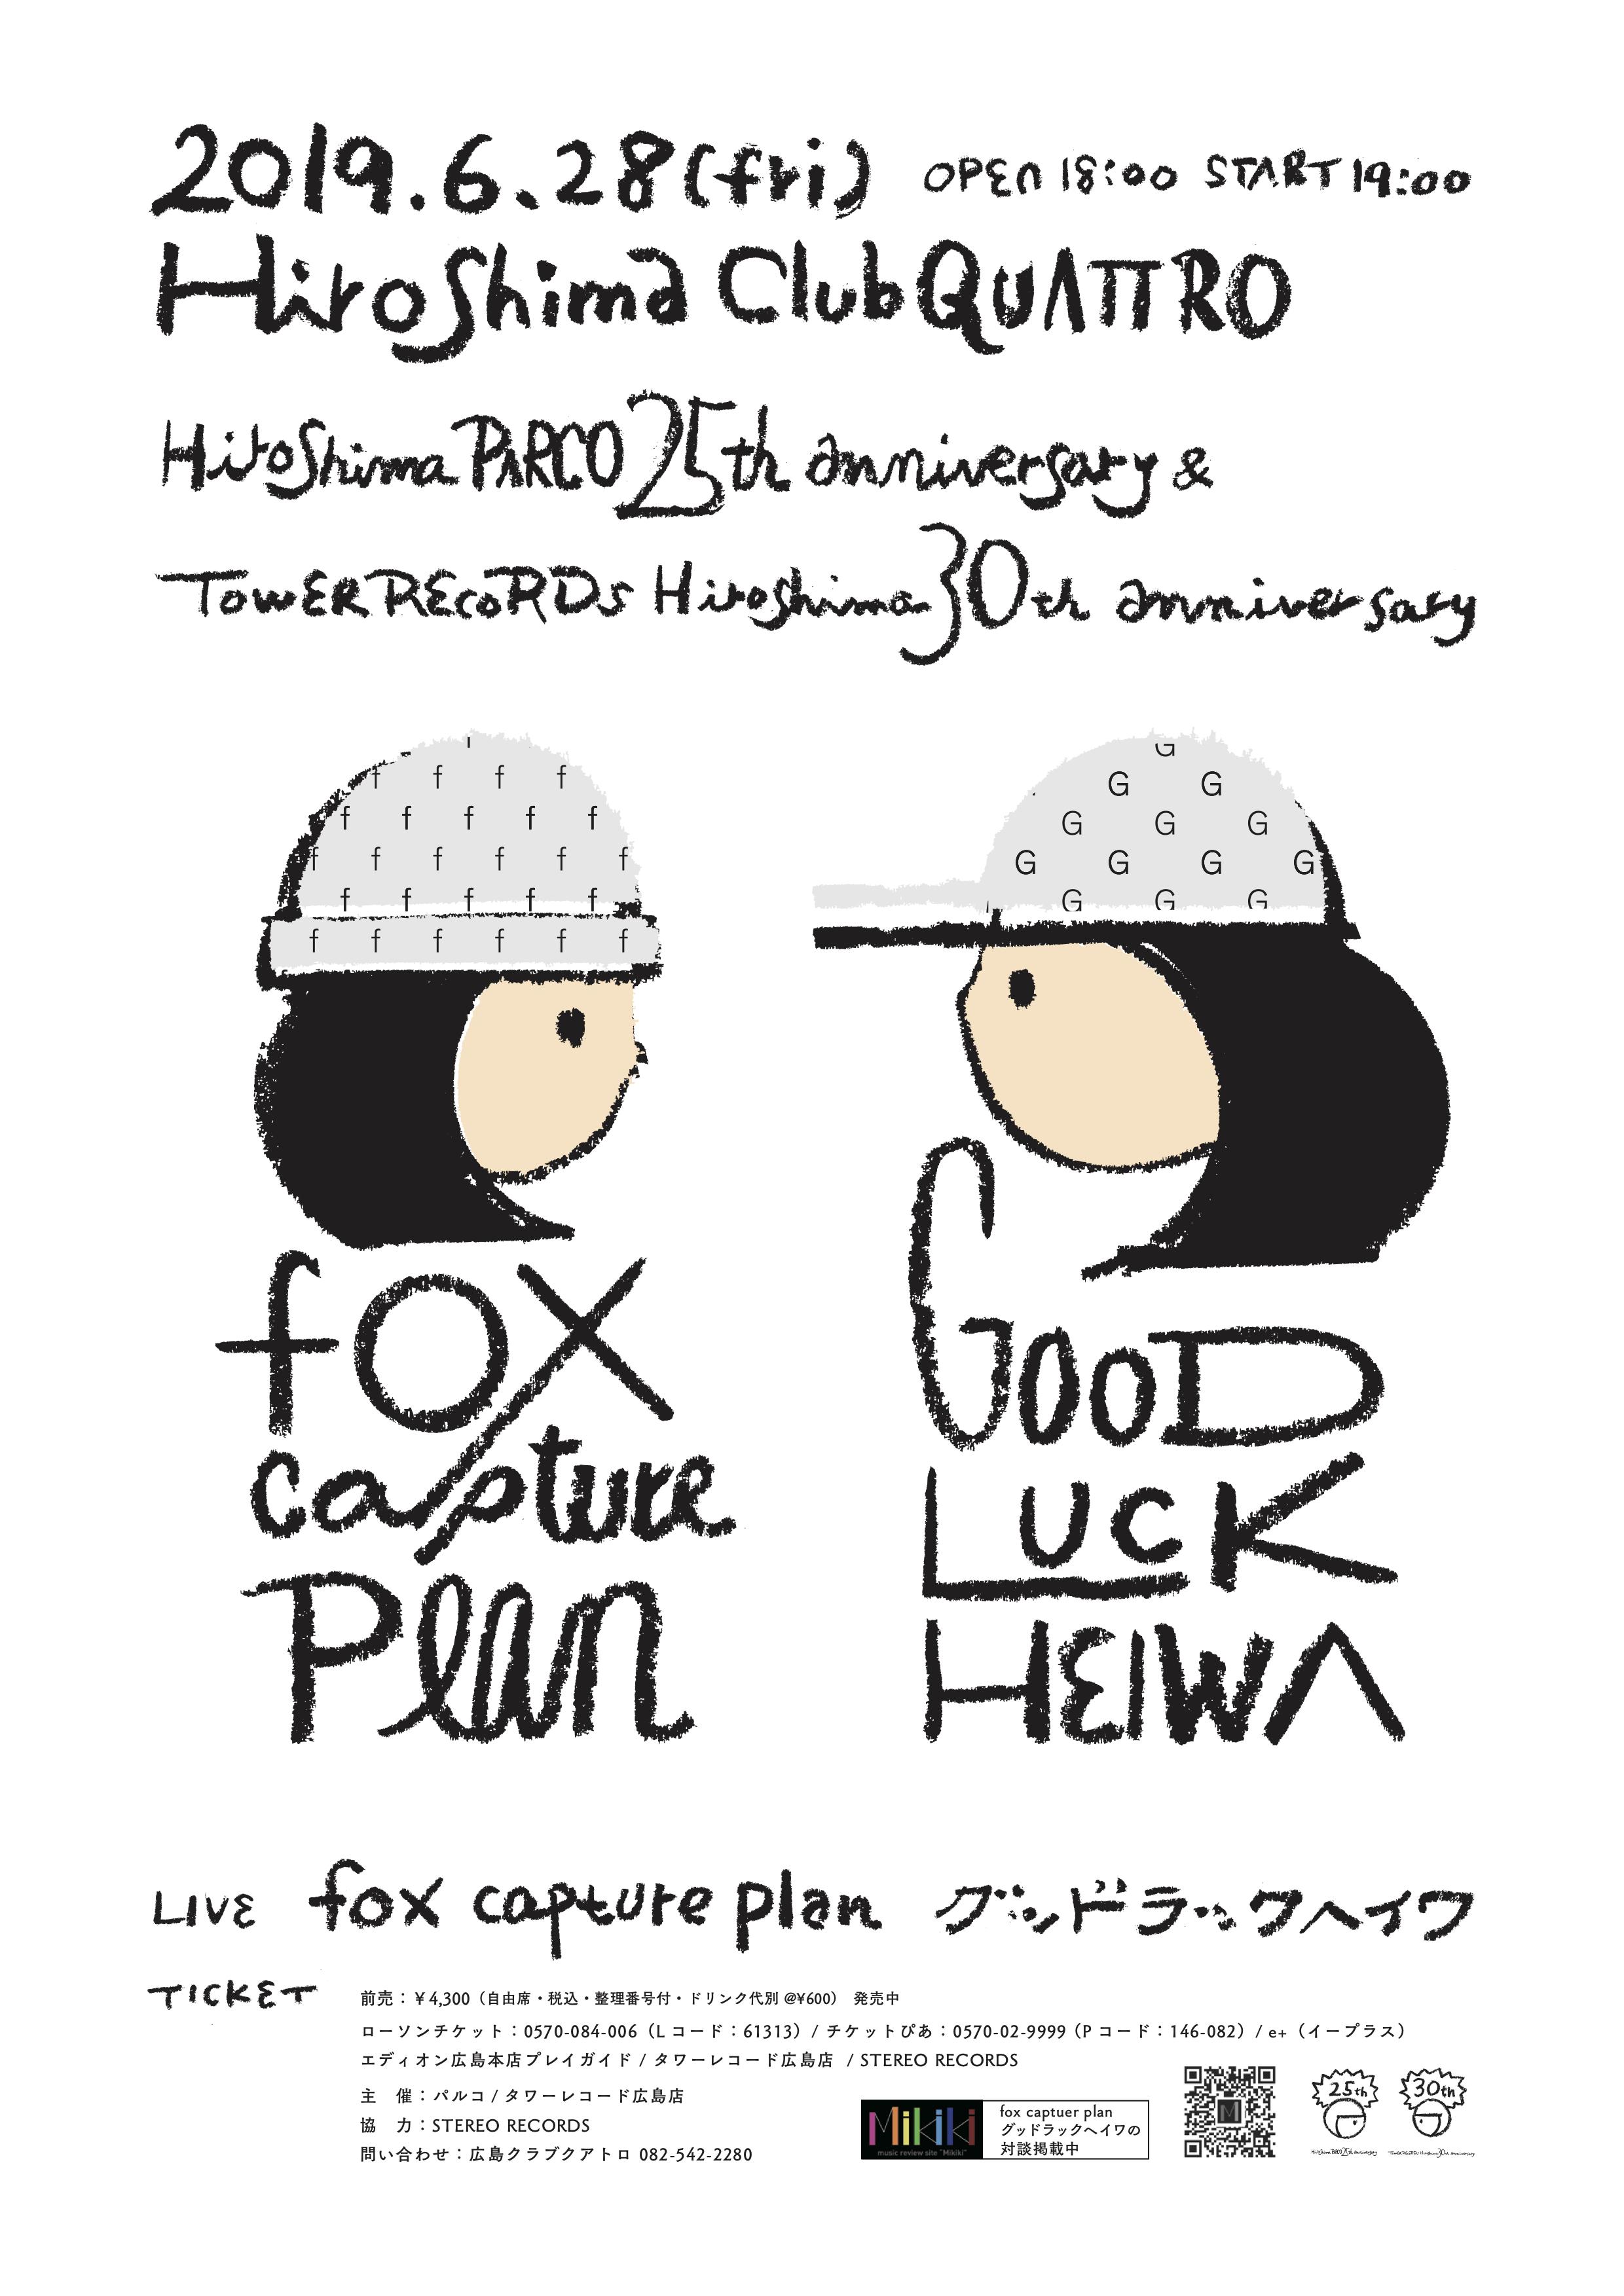 http://goodluckheiwa.galactic-label.jp/news/flyer_190515b_H1.jpg